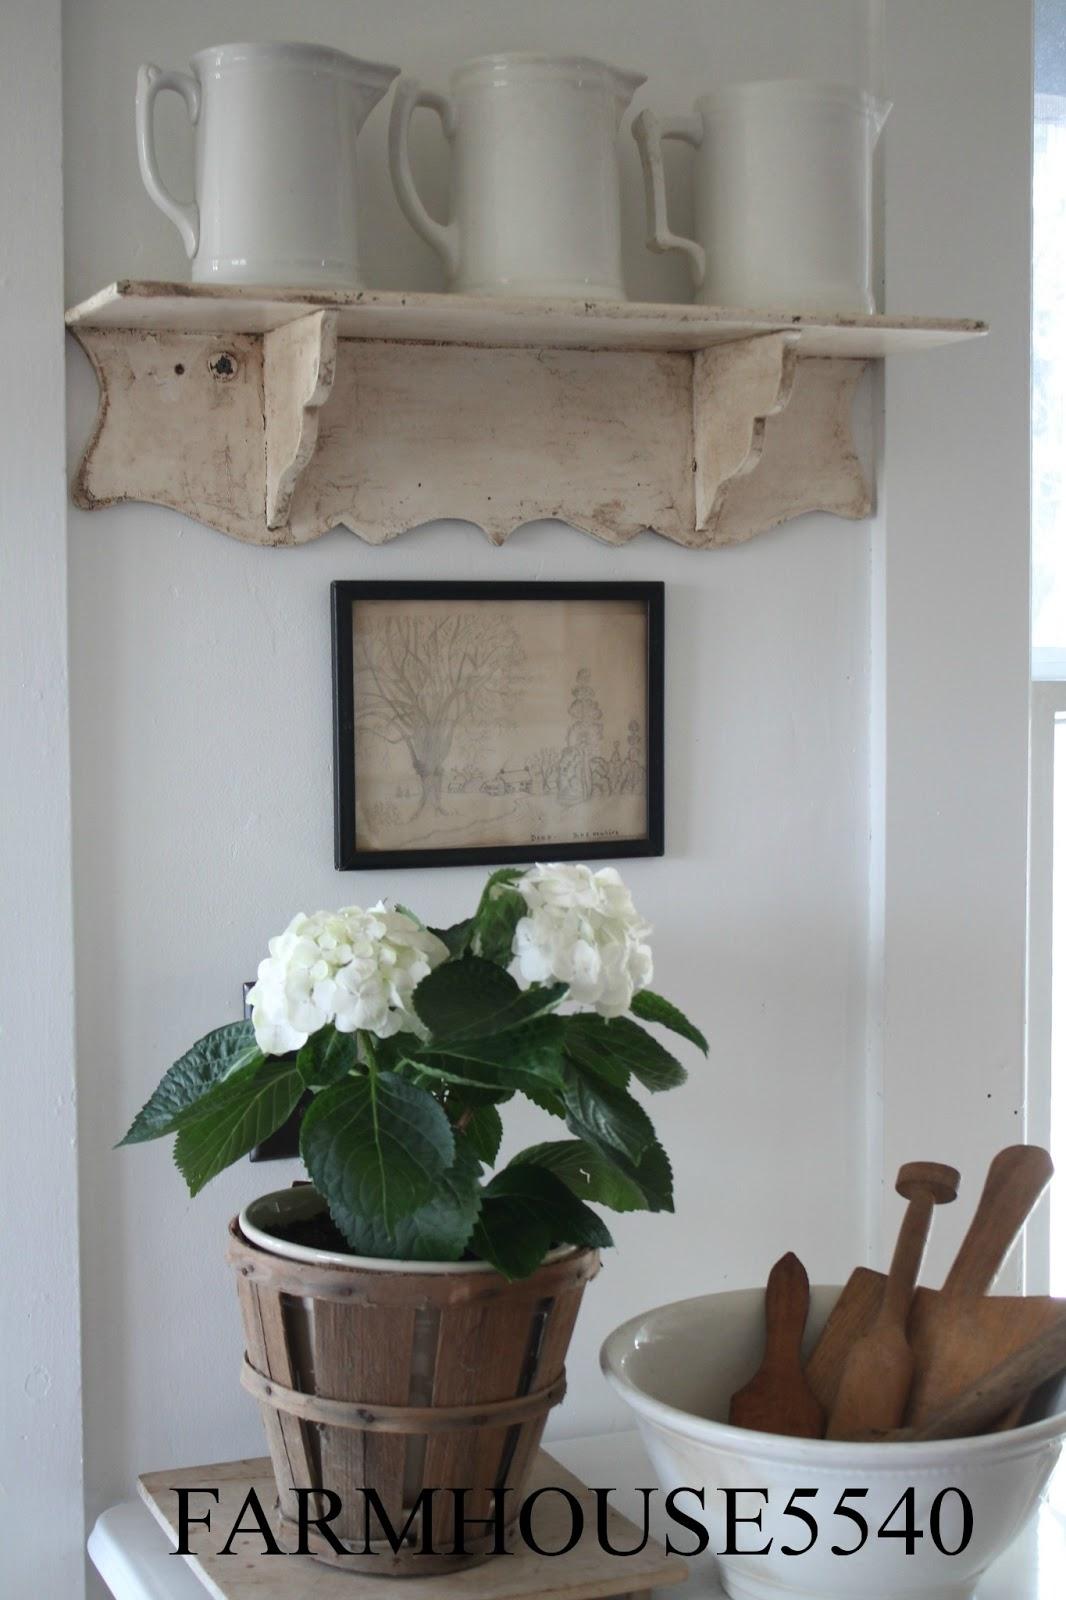 FARMHOUSE 5540 Little White Cupboard